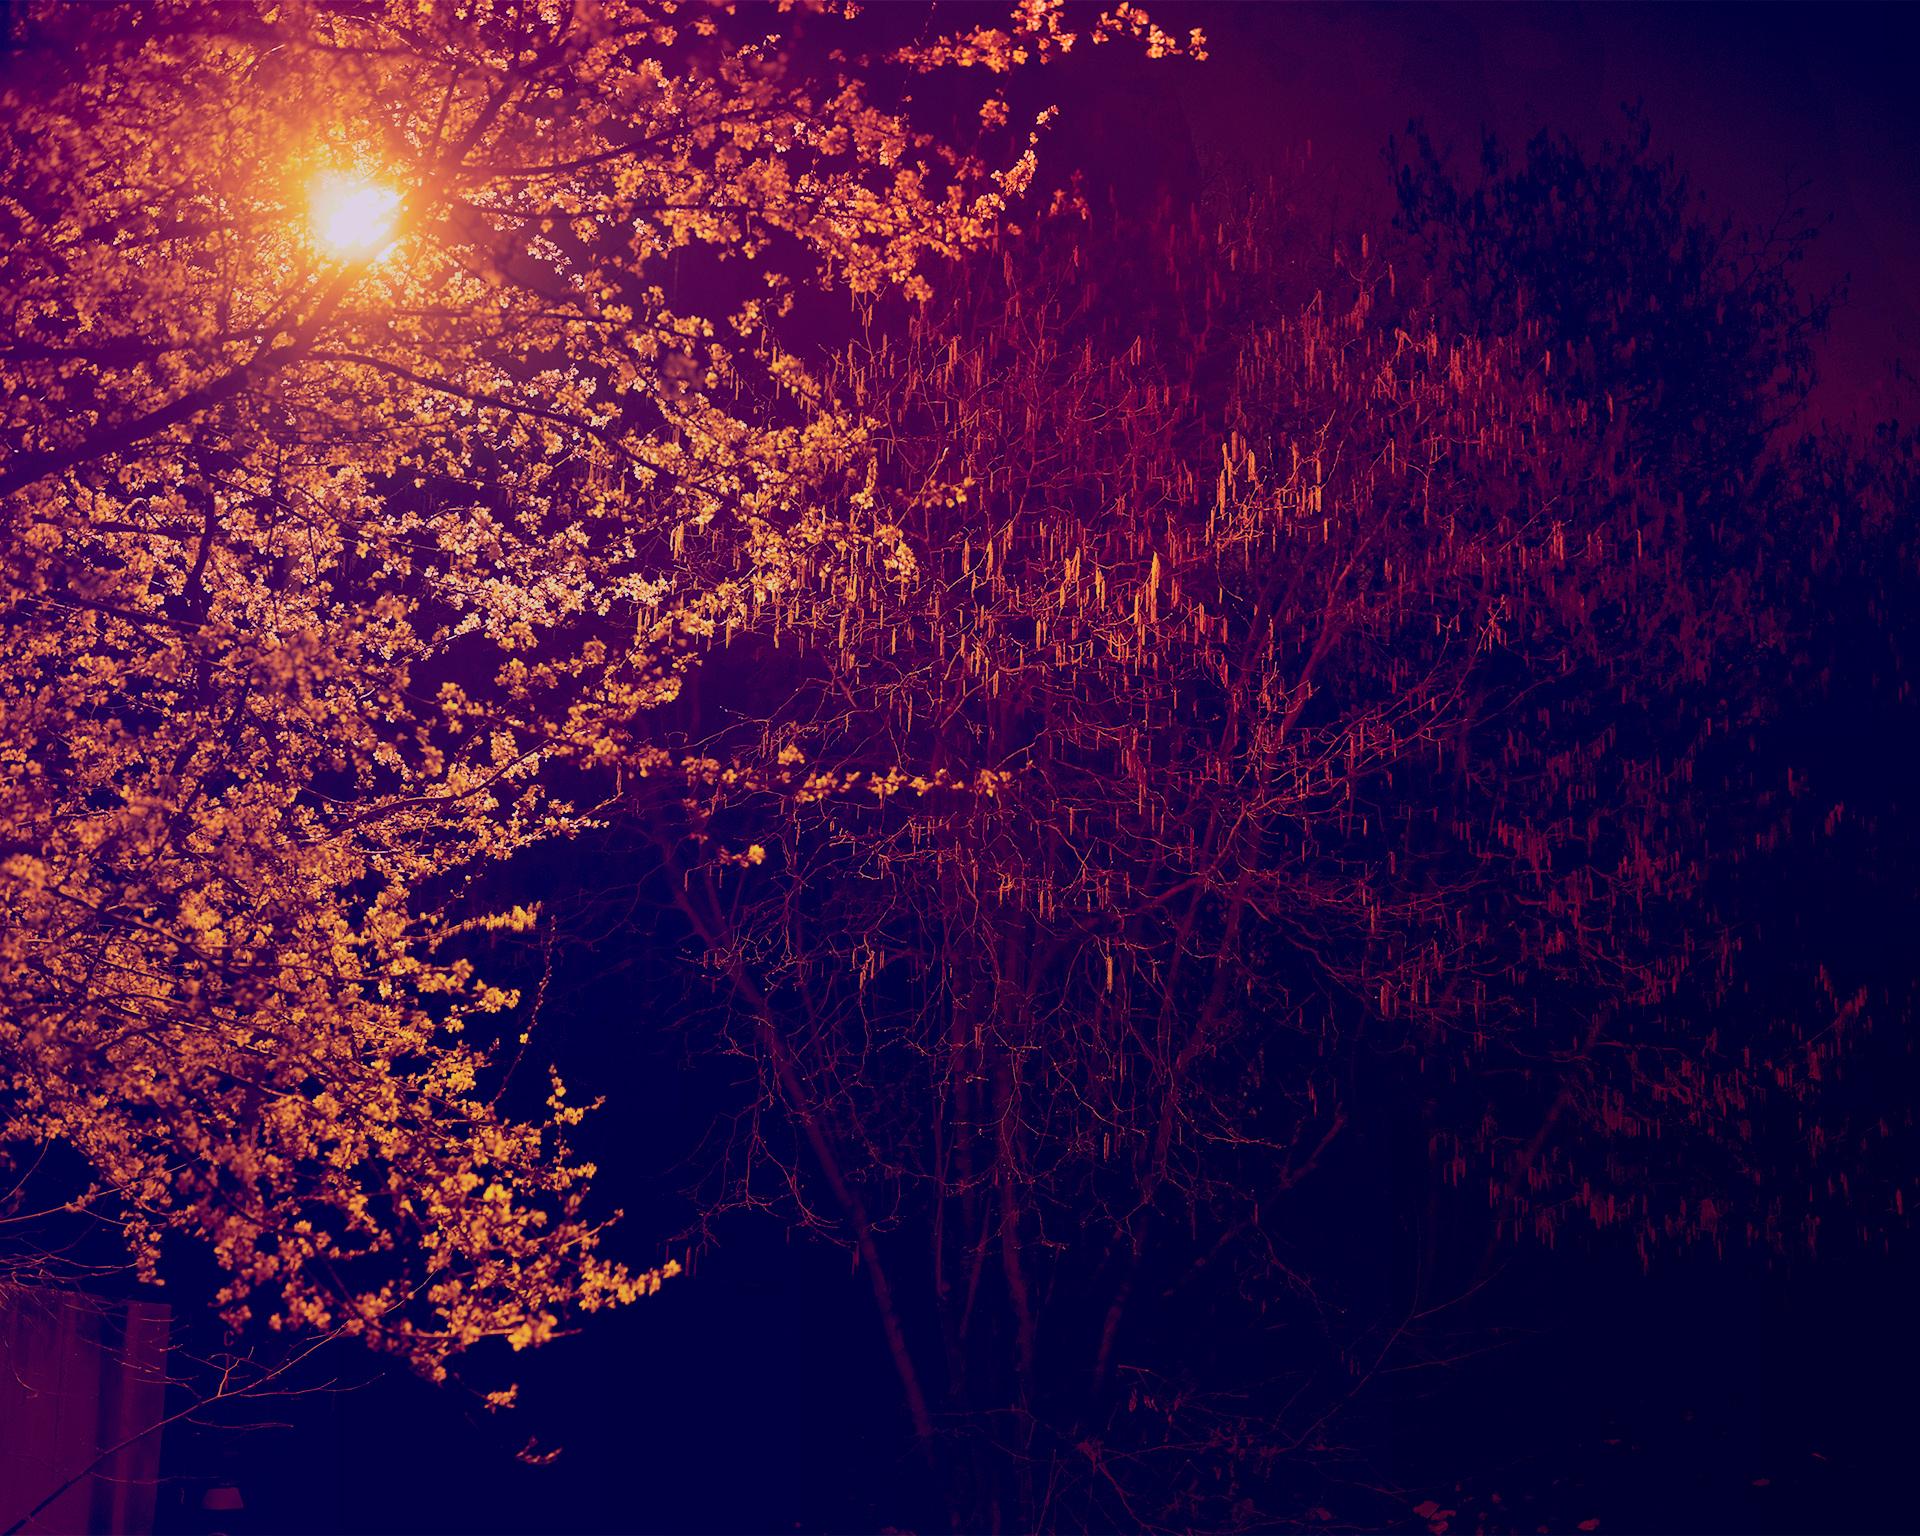 FerrierEstate_Tree_at_Night_a.jpg